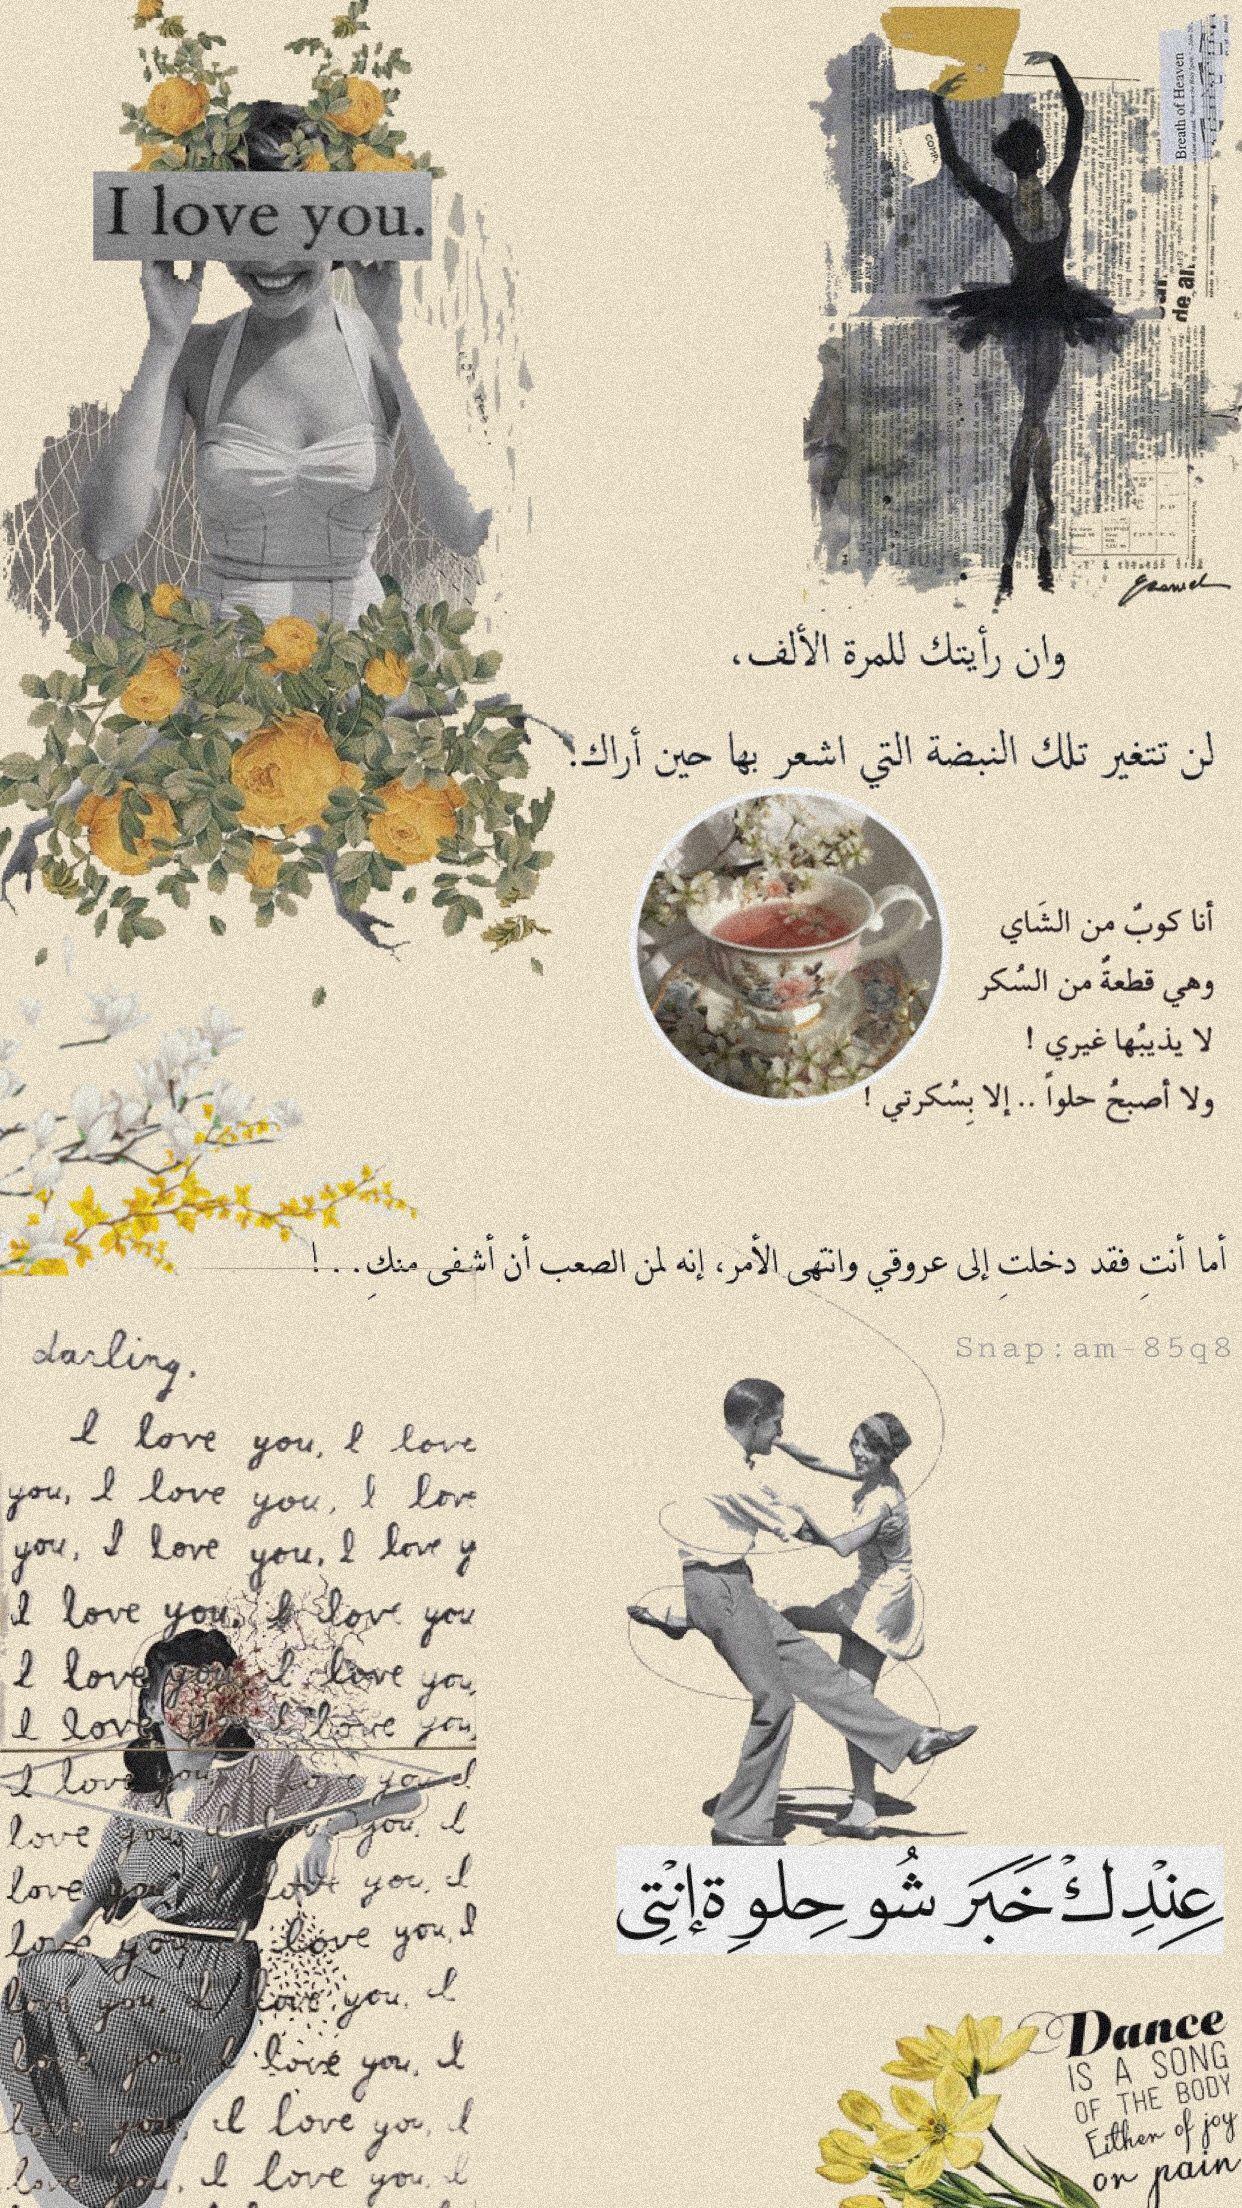 كل هالدنيا أماني Iphone Wallpaper Quotes Love Love Quotes Wallpaper Floral Wallpaper Iphone